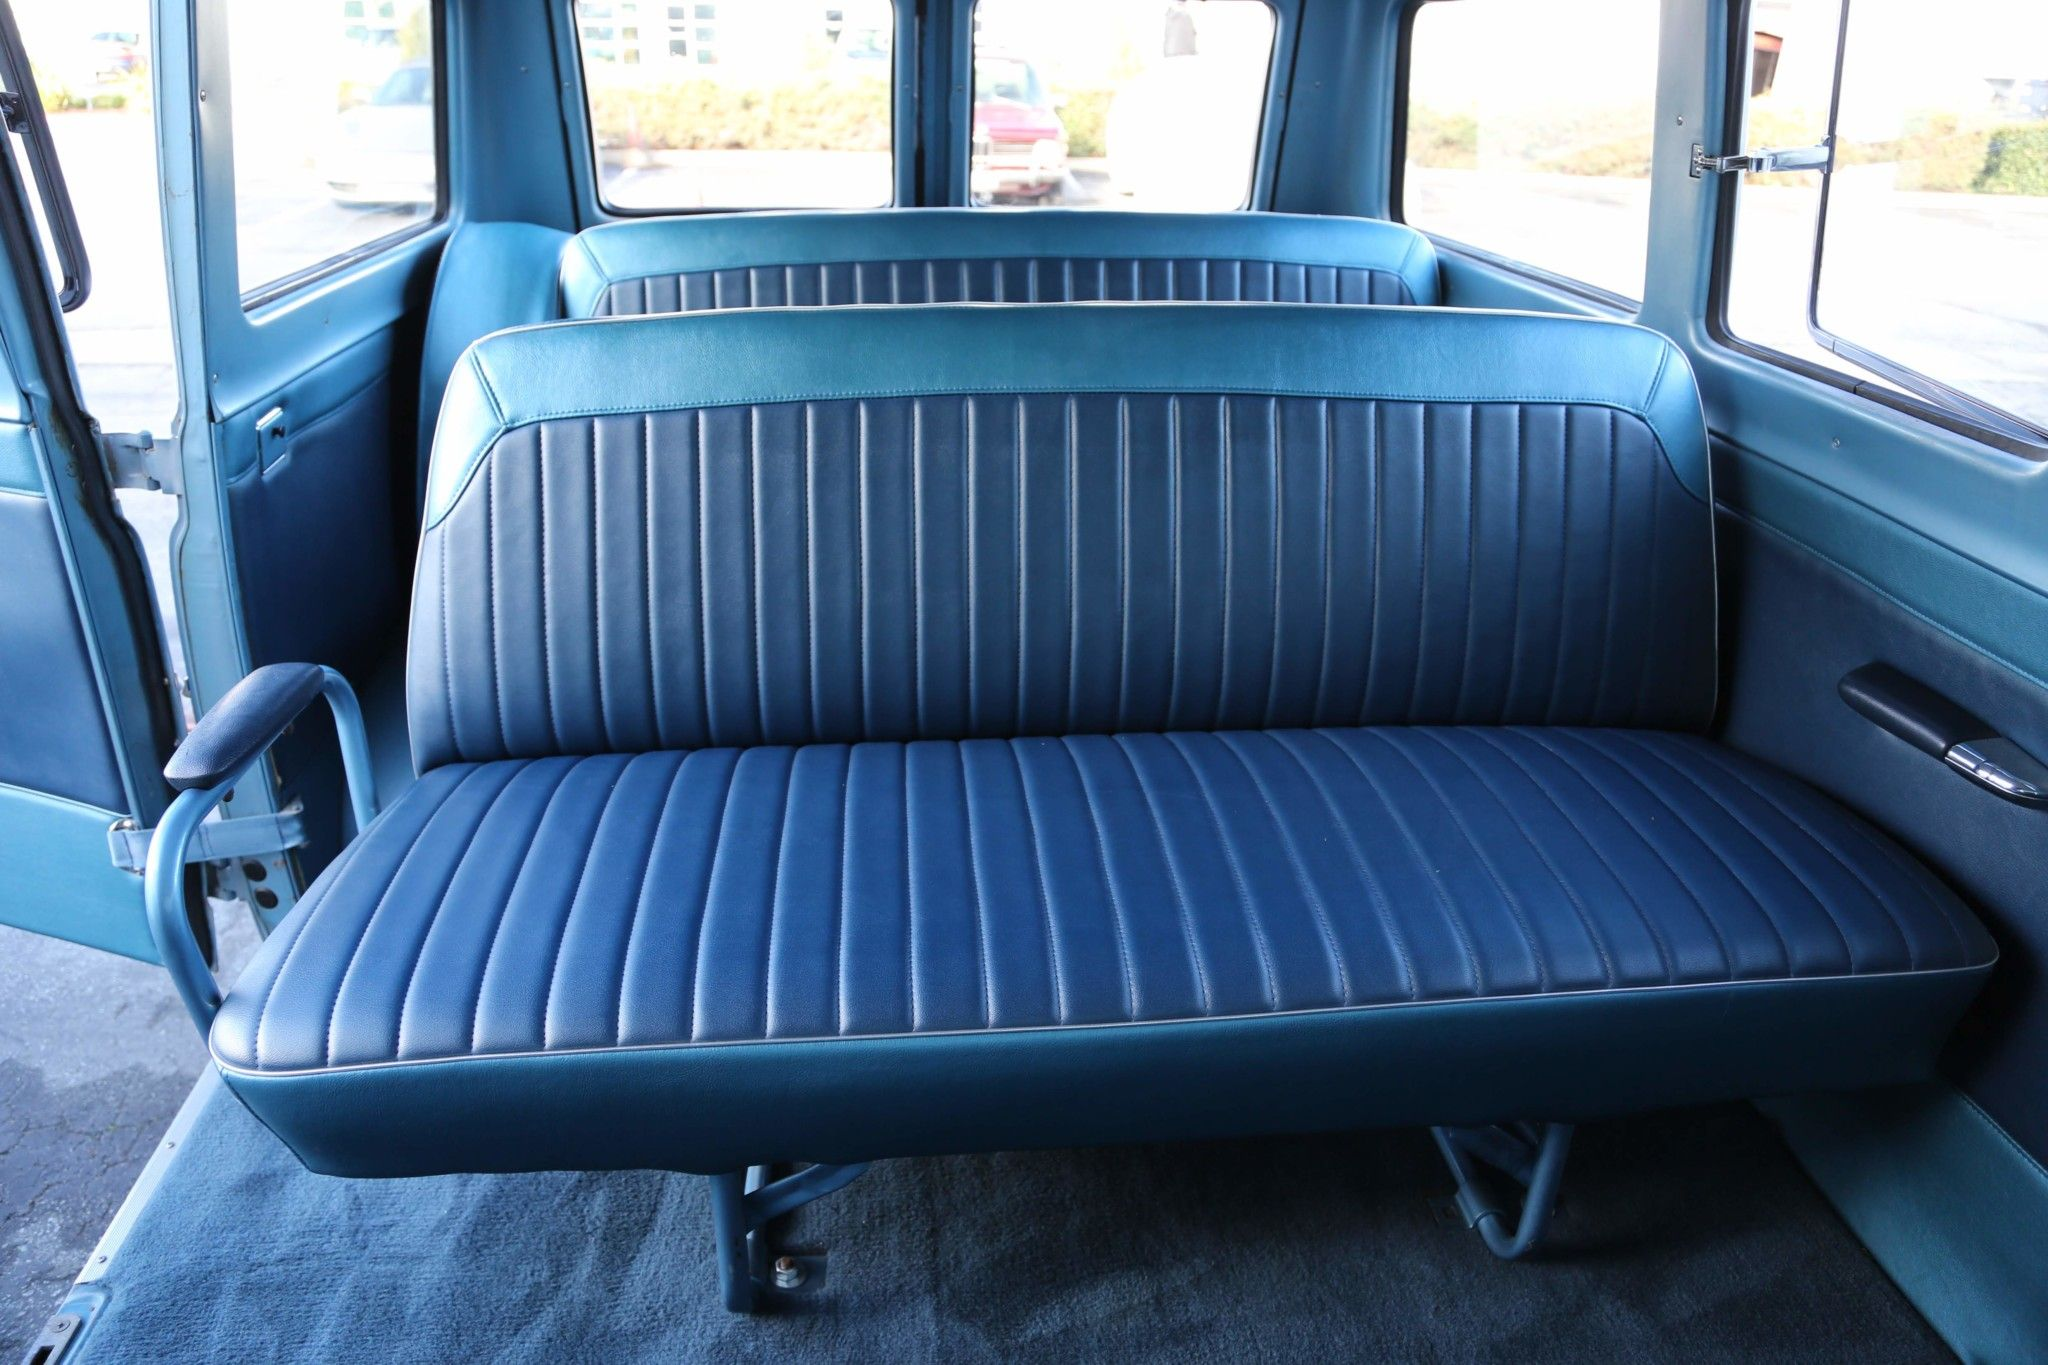 1963 Econoline Falcon Bench Seats Ford Falcon Wagons For Sale Ford